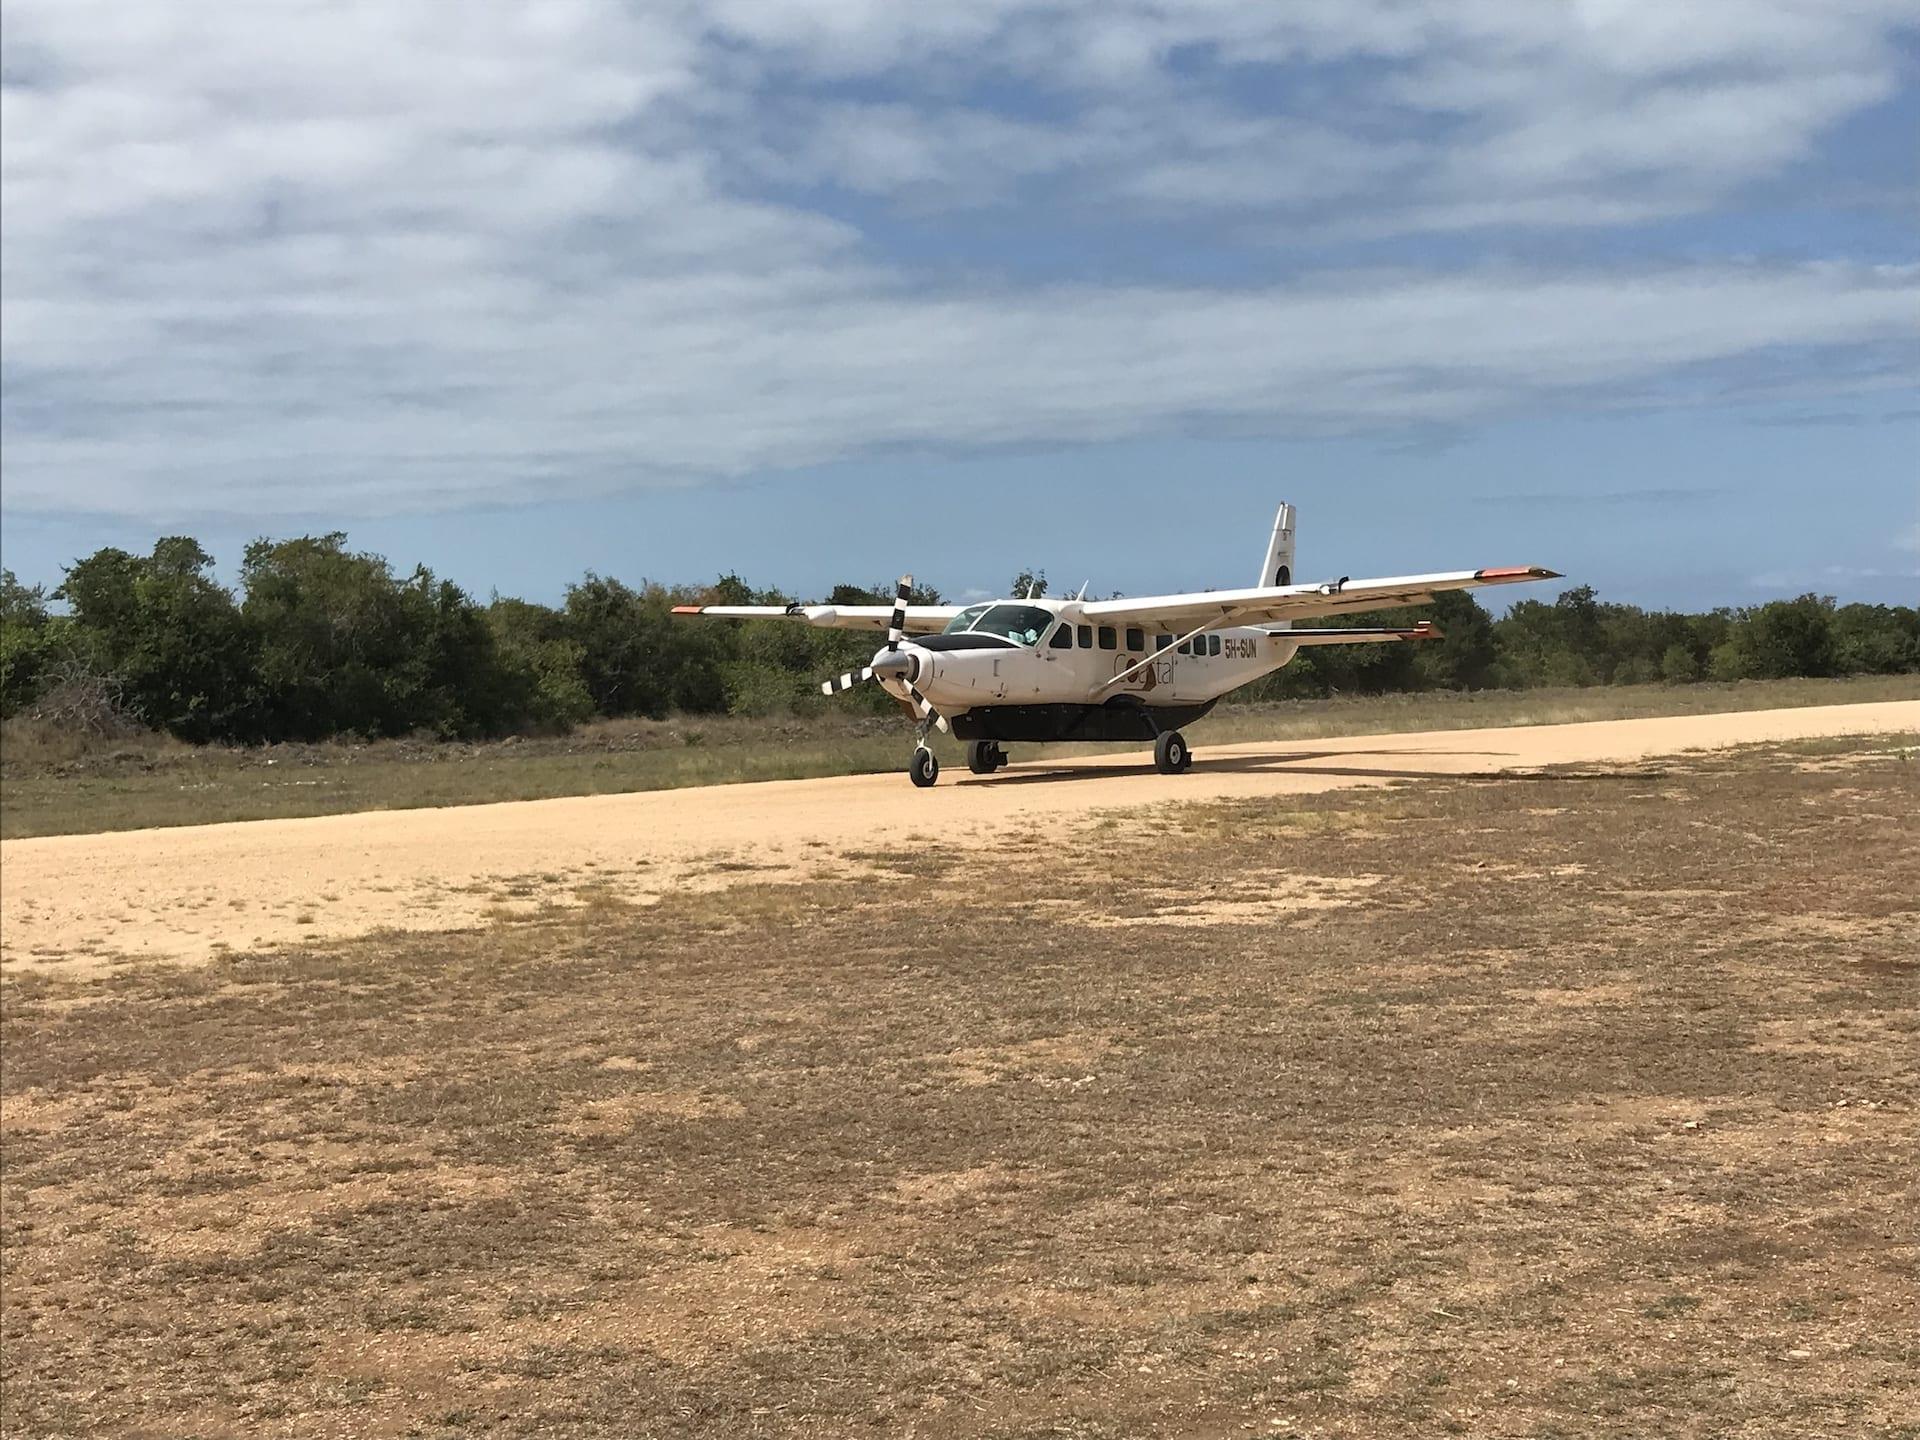 ALGEMEEN - TZ - Saadani_ airstrip met vliegtuig 4841